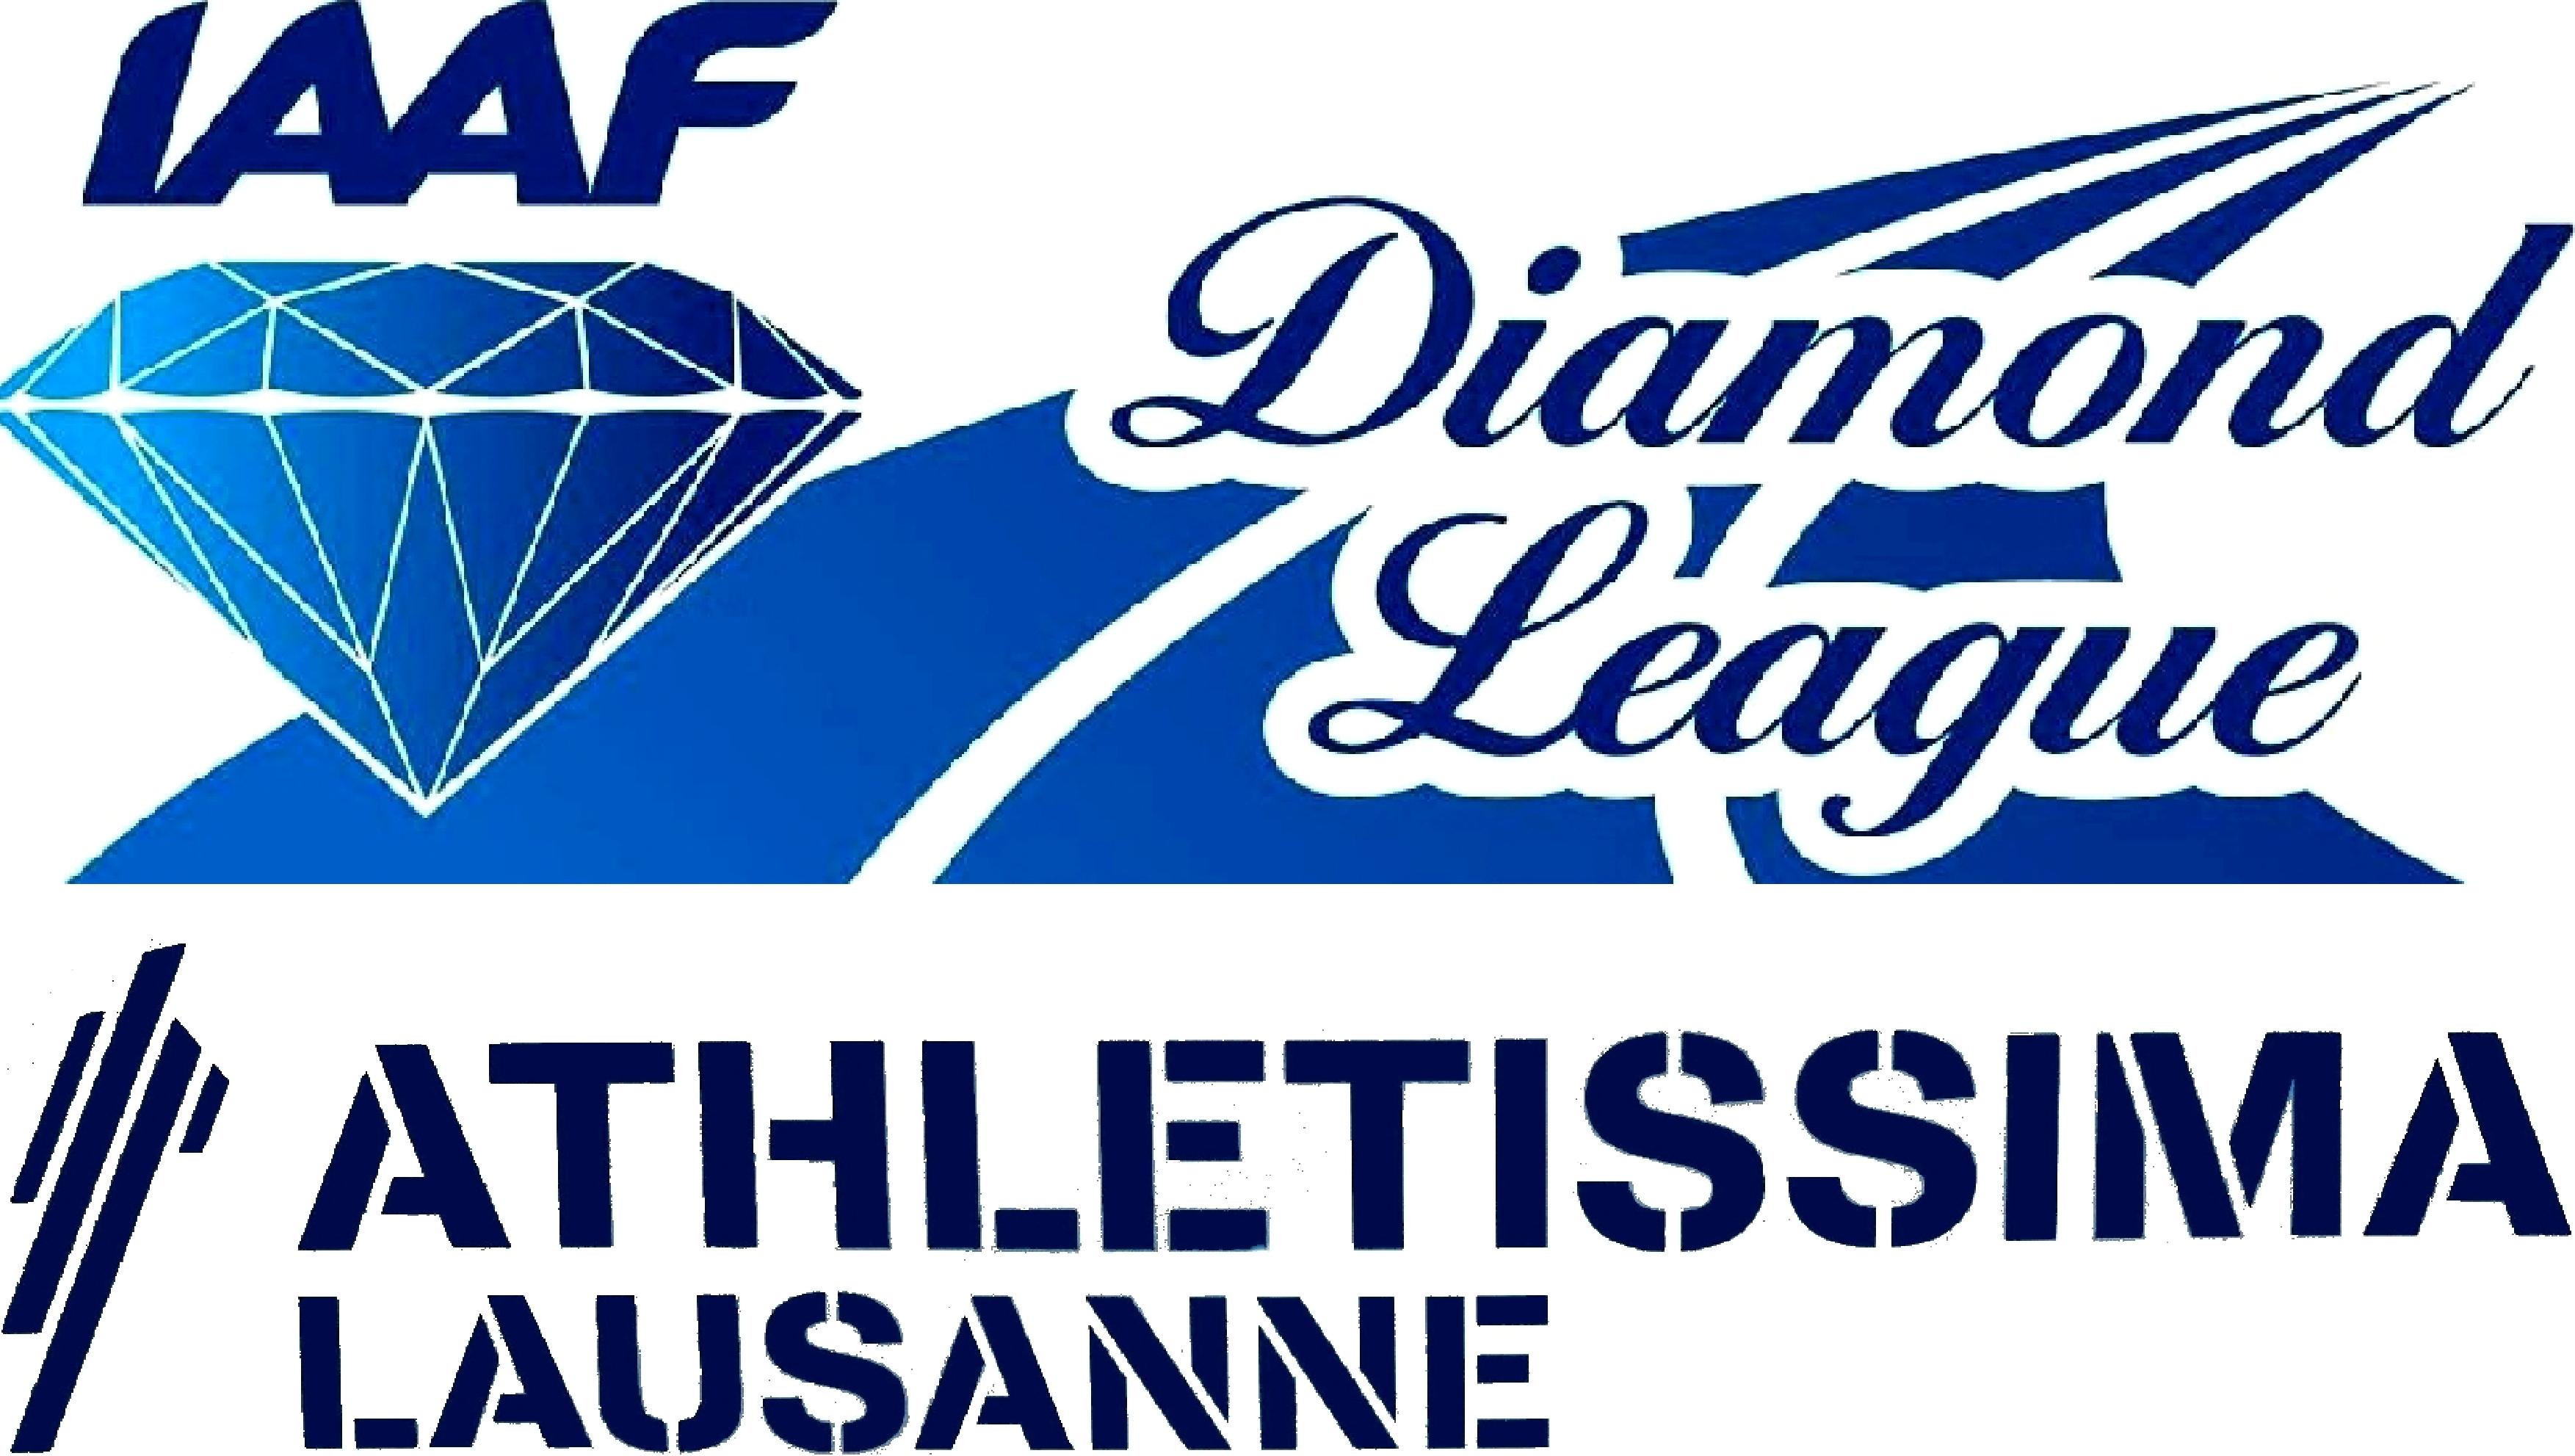 Meeting Athletissima à Lausanne